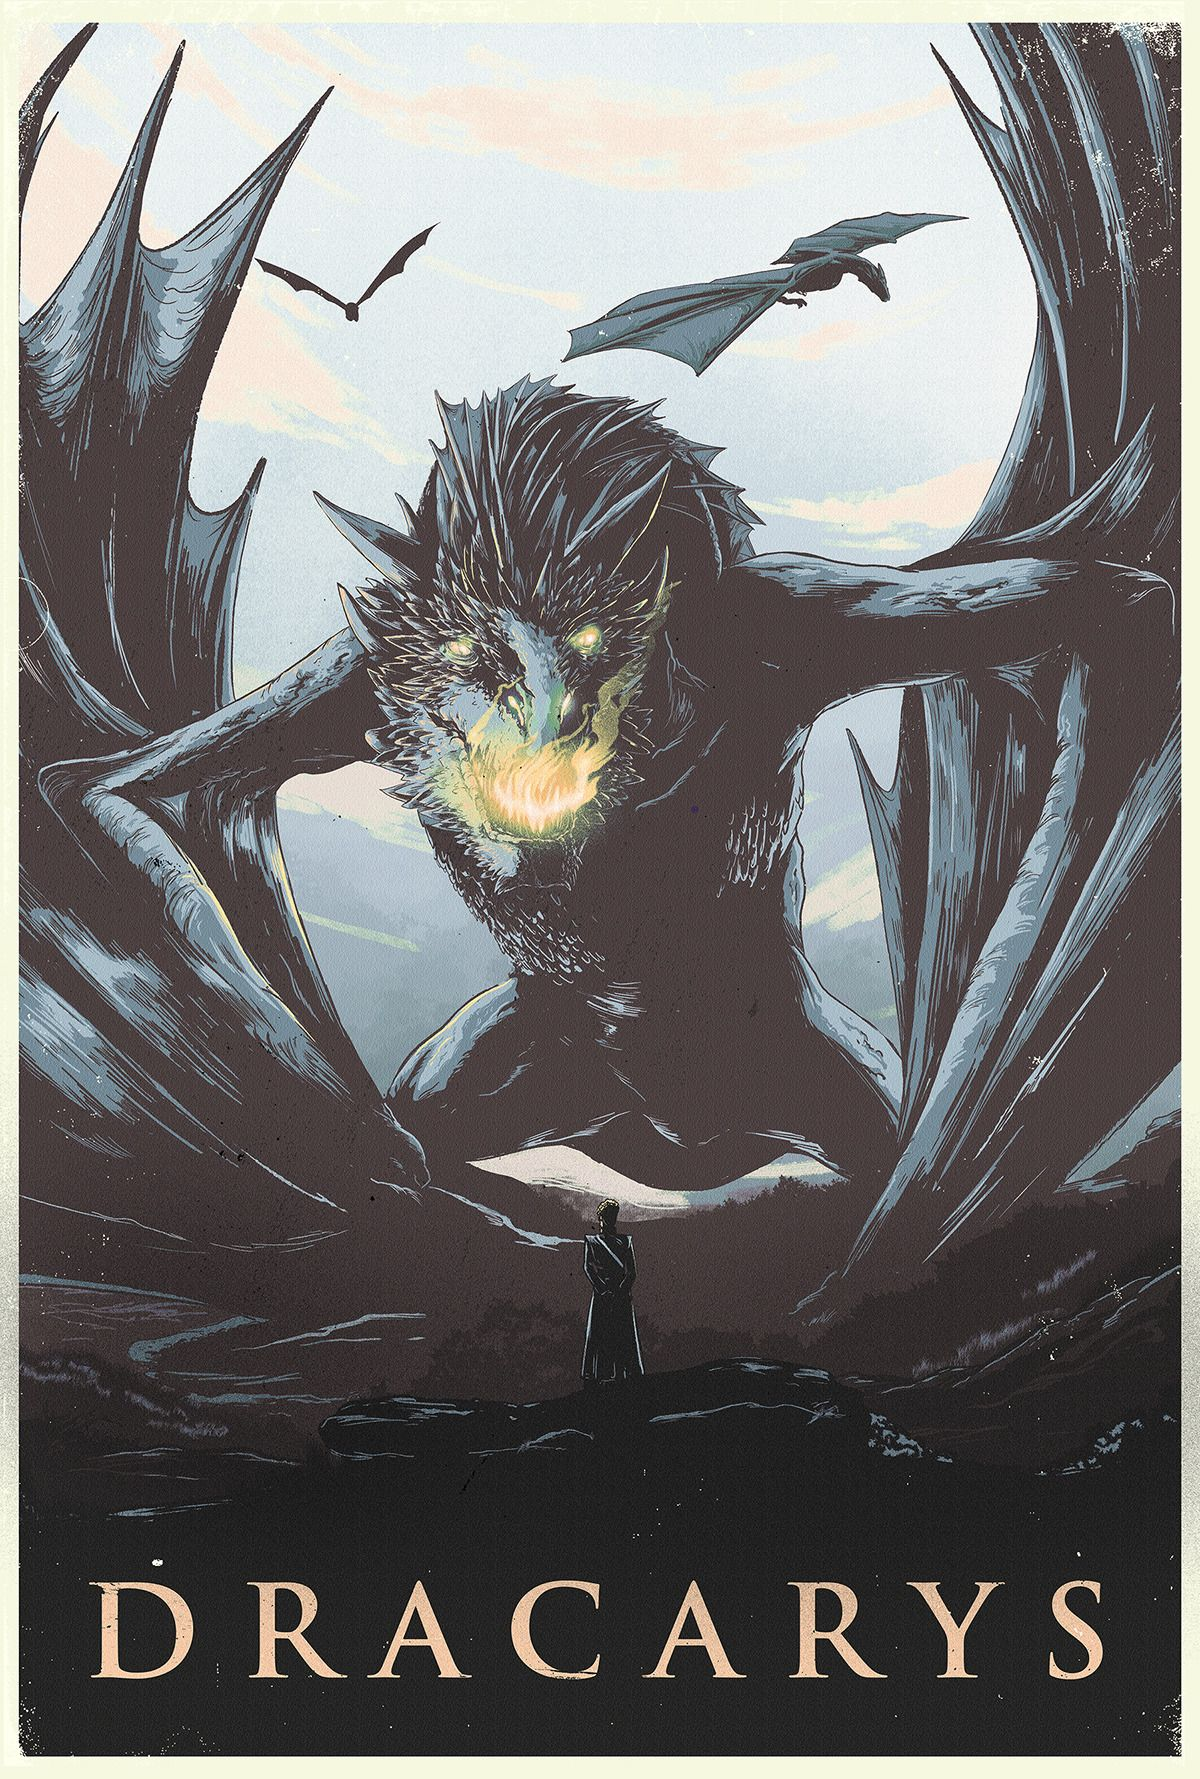 Game Of Thrones Dracarys Created By Nicolas Alejandro Barbera